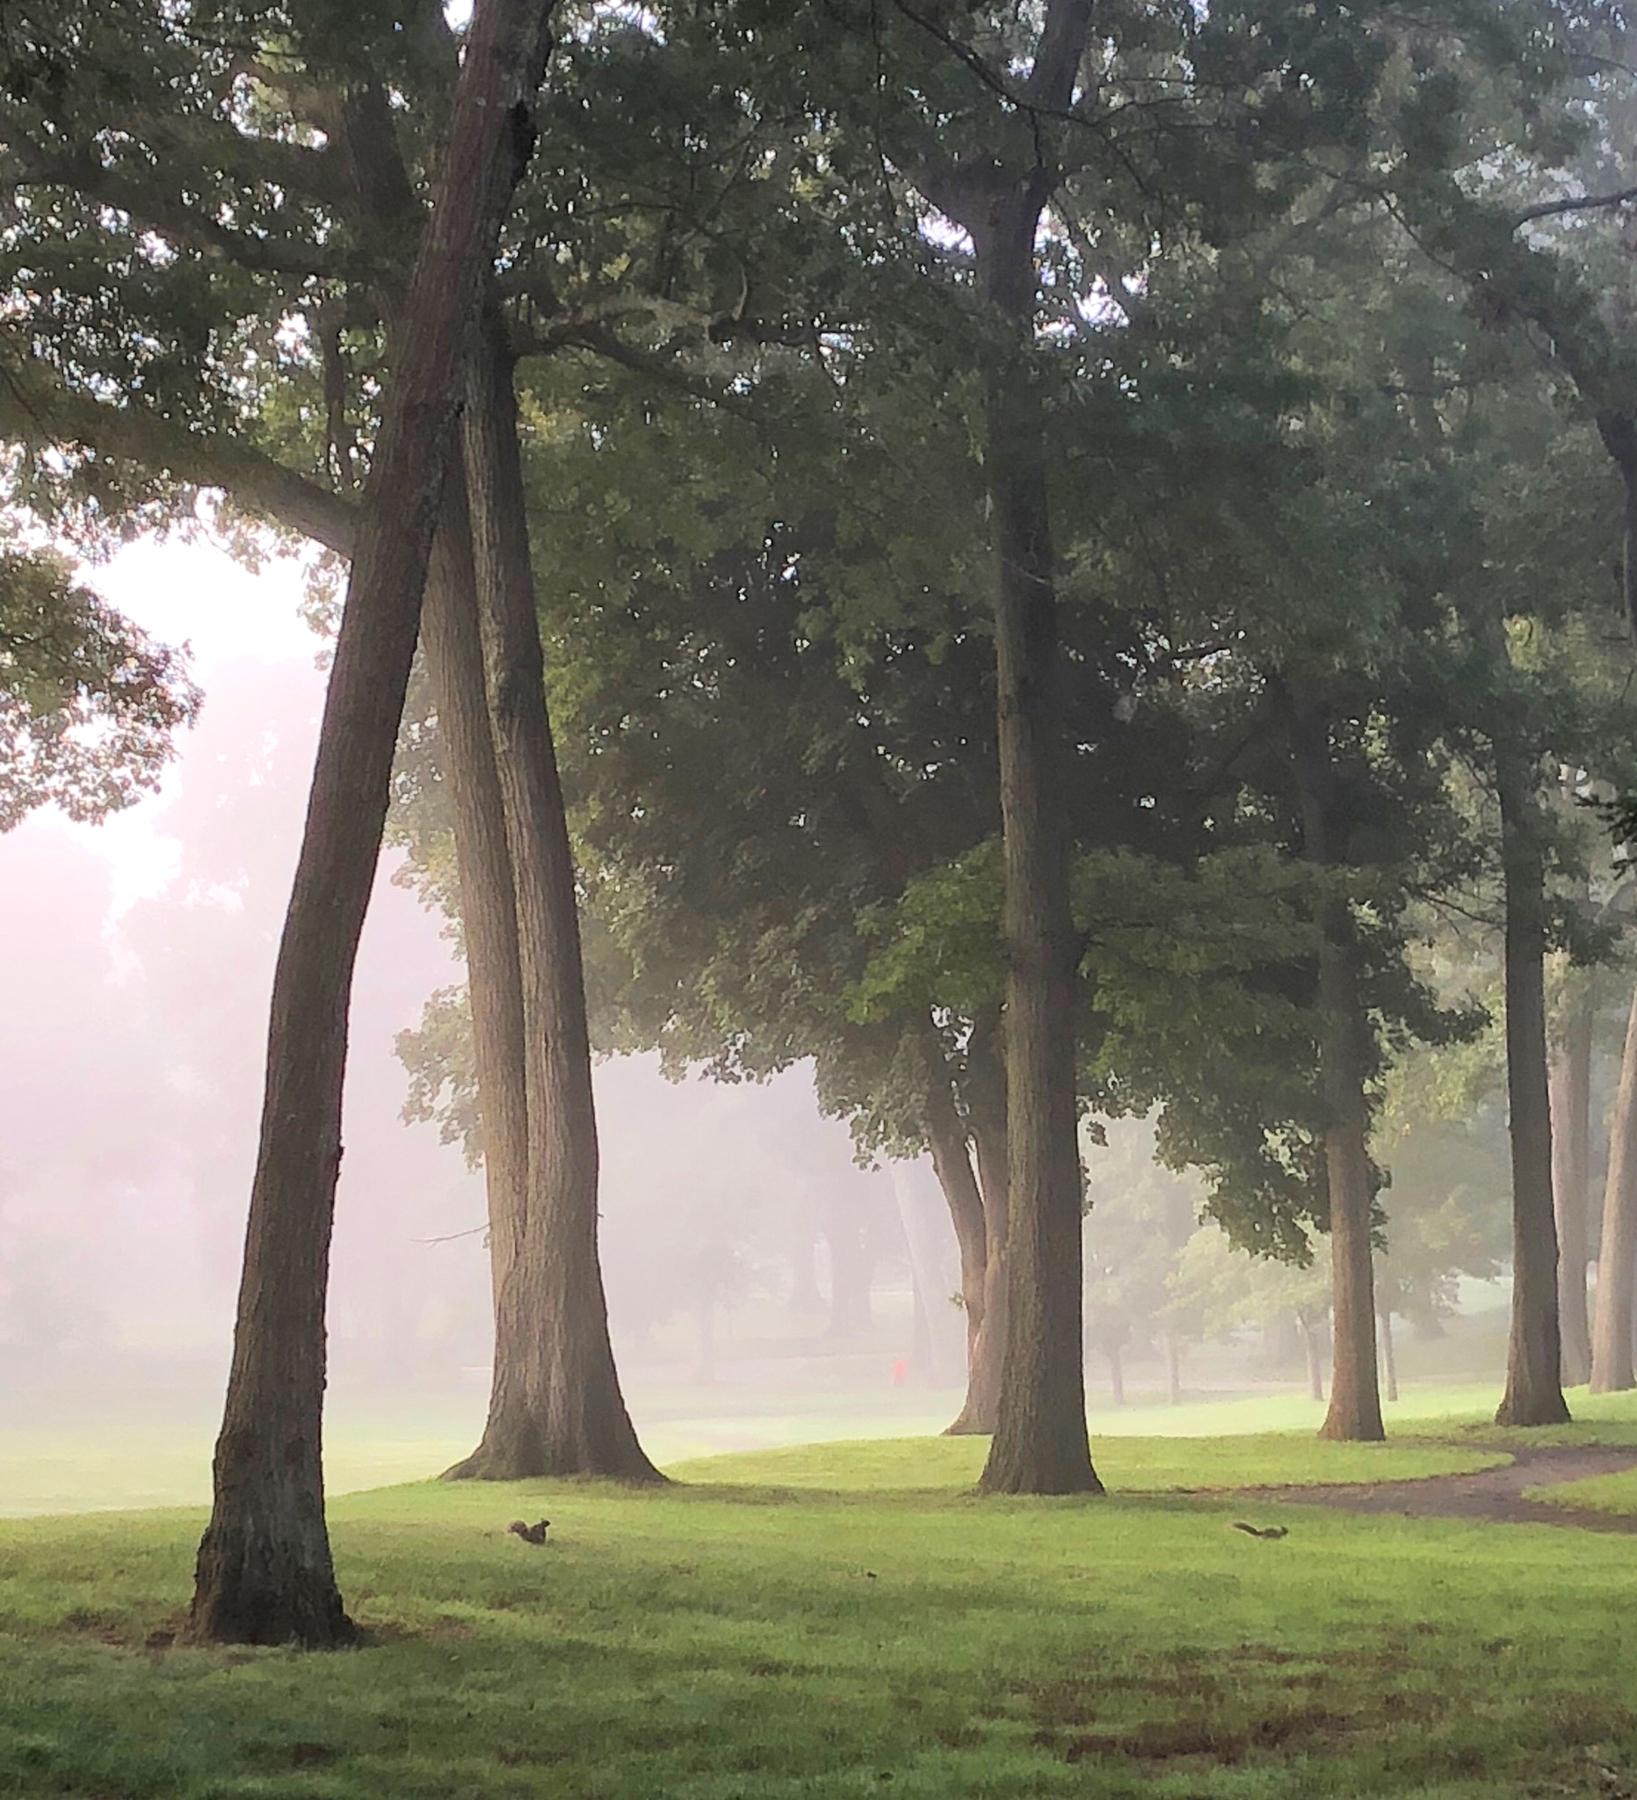 carol_wontkowski_landscapeseascape_stillness2_3.jpg